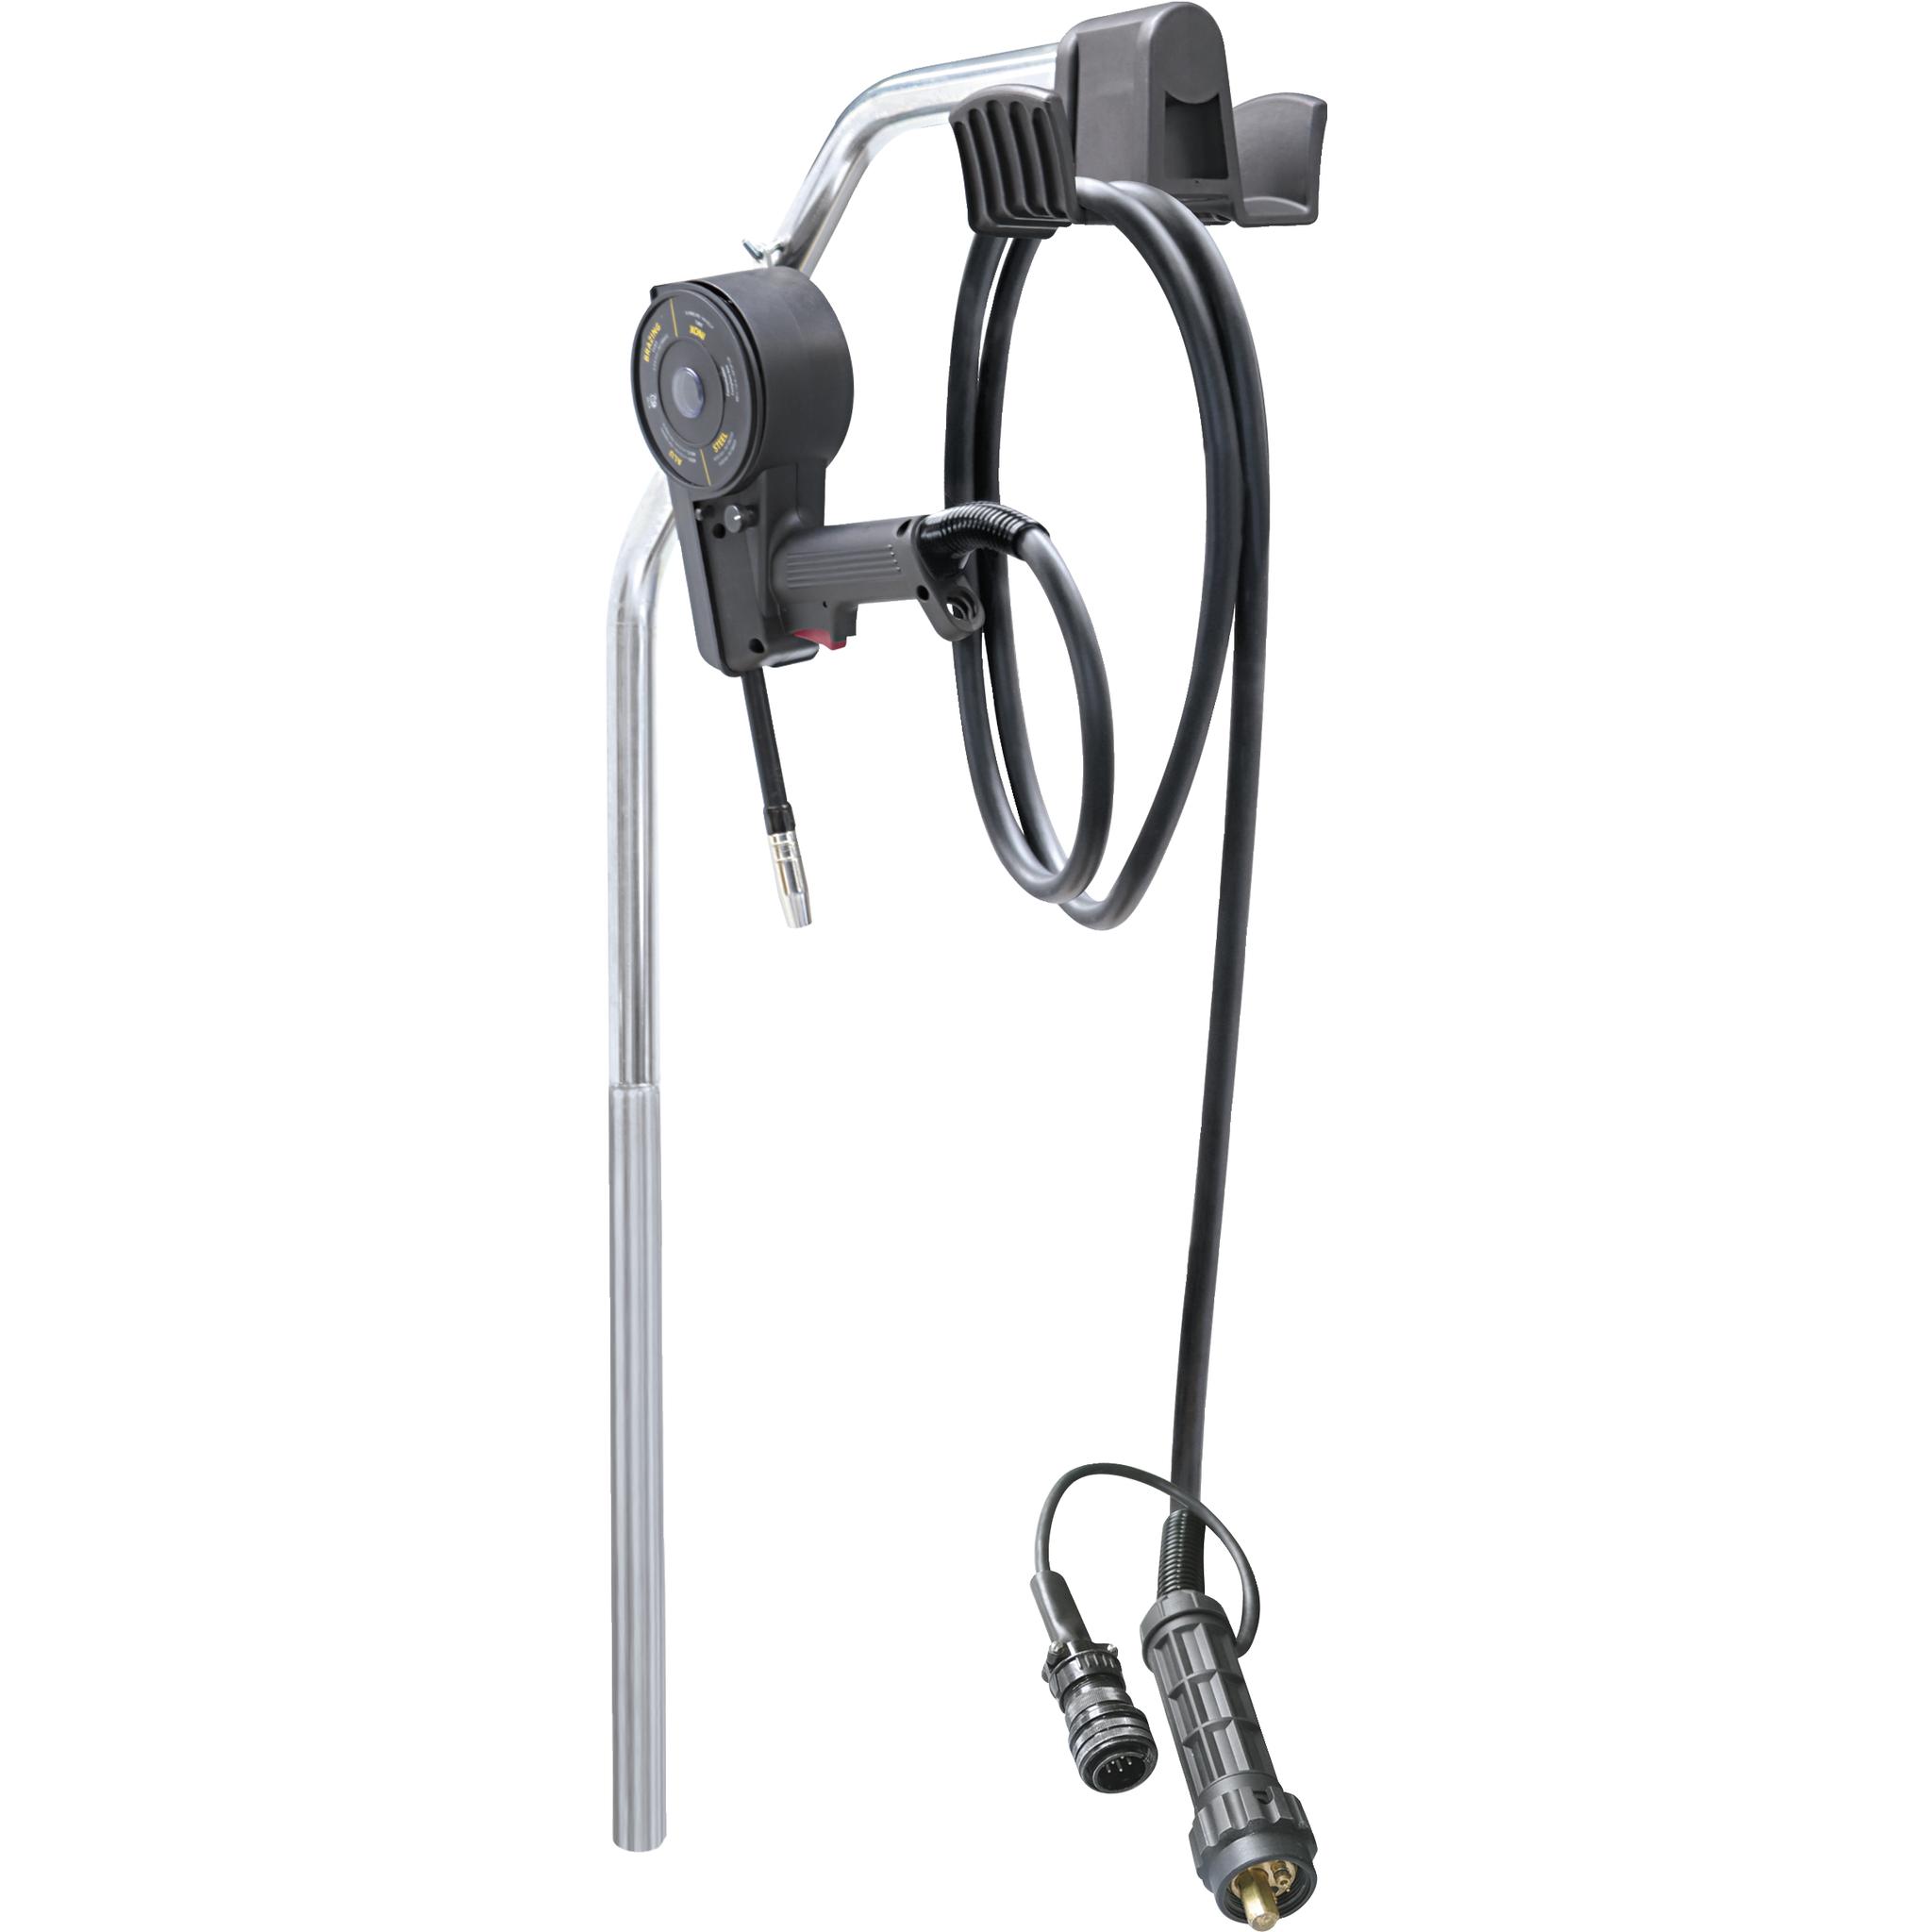 GYS Spool Gun Brenner mit Ausleger 041493